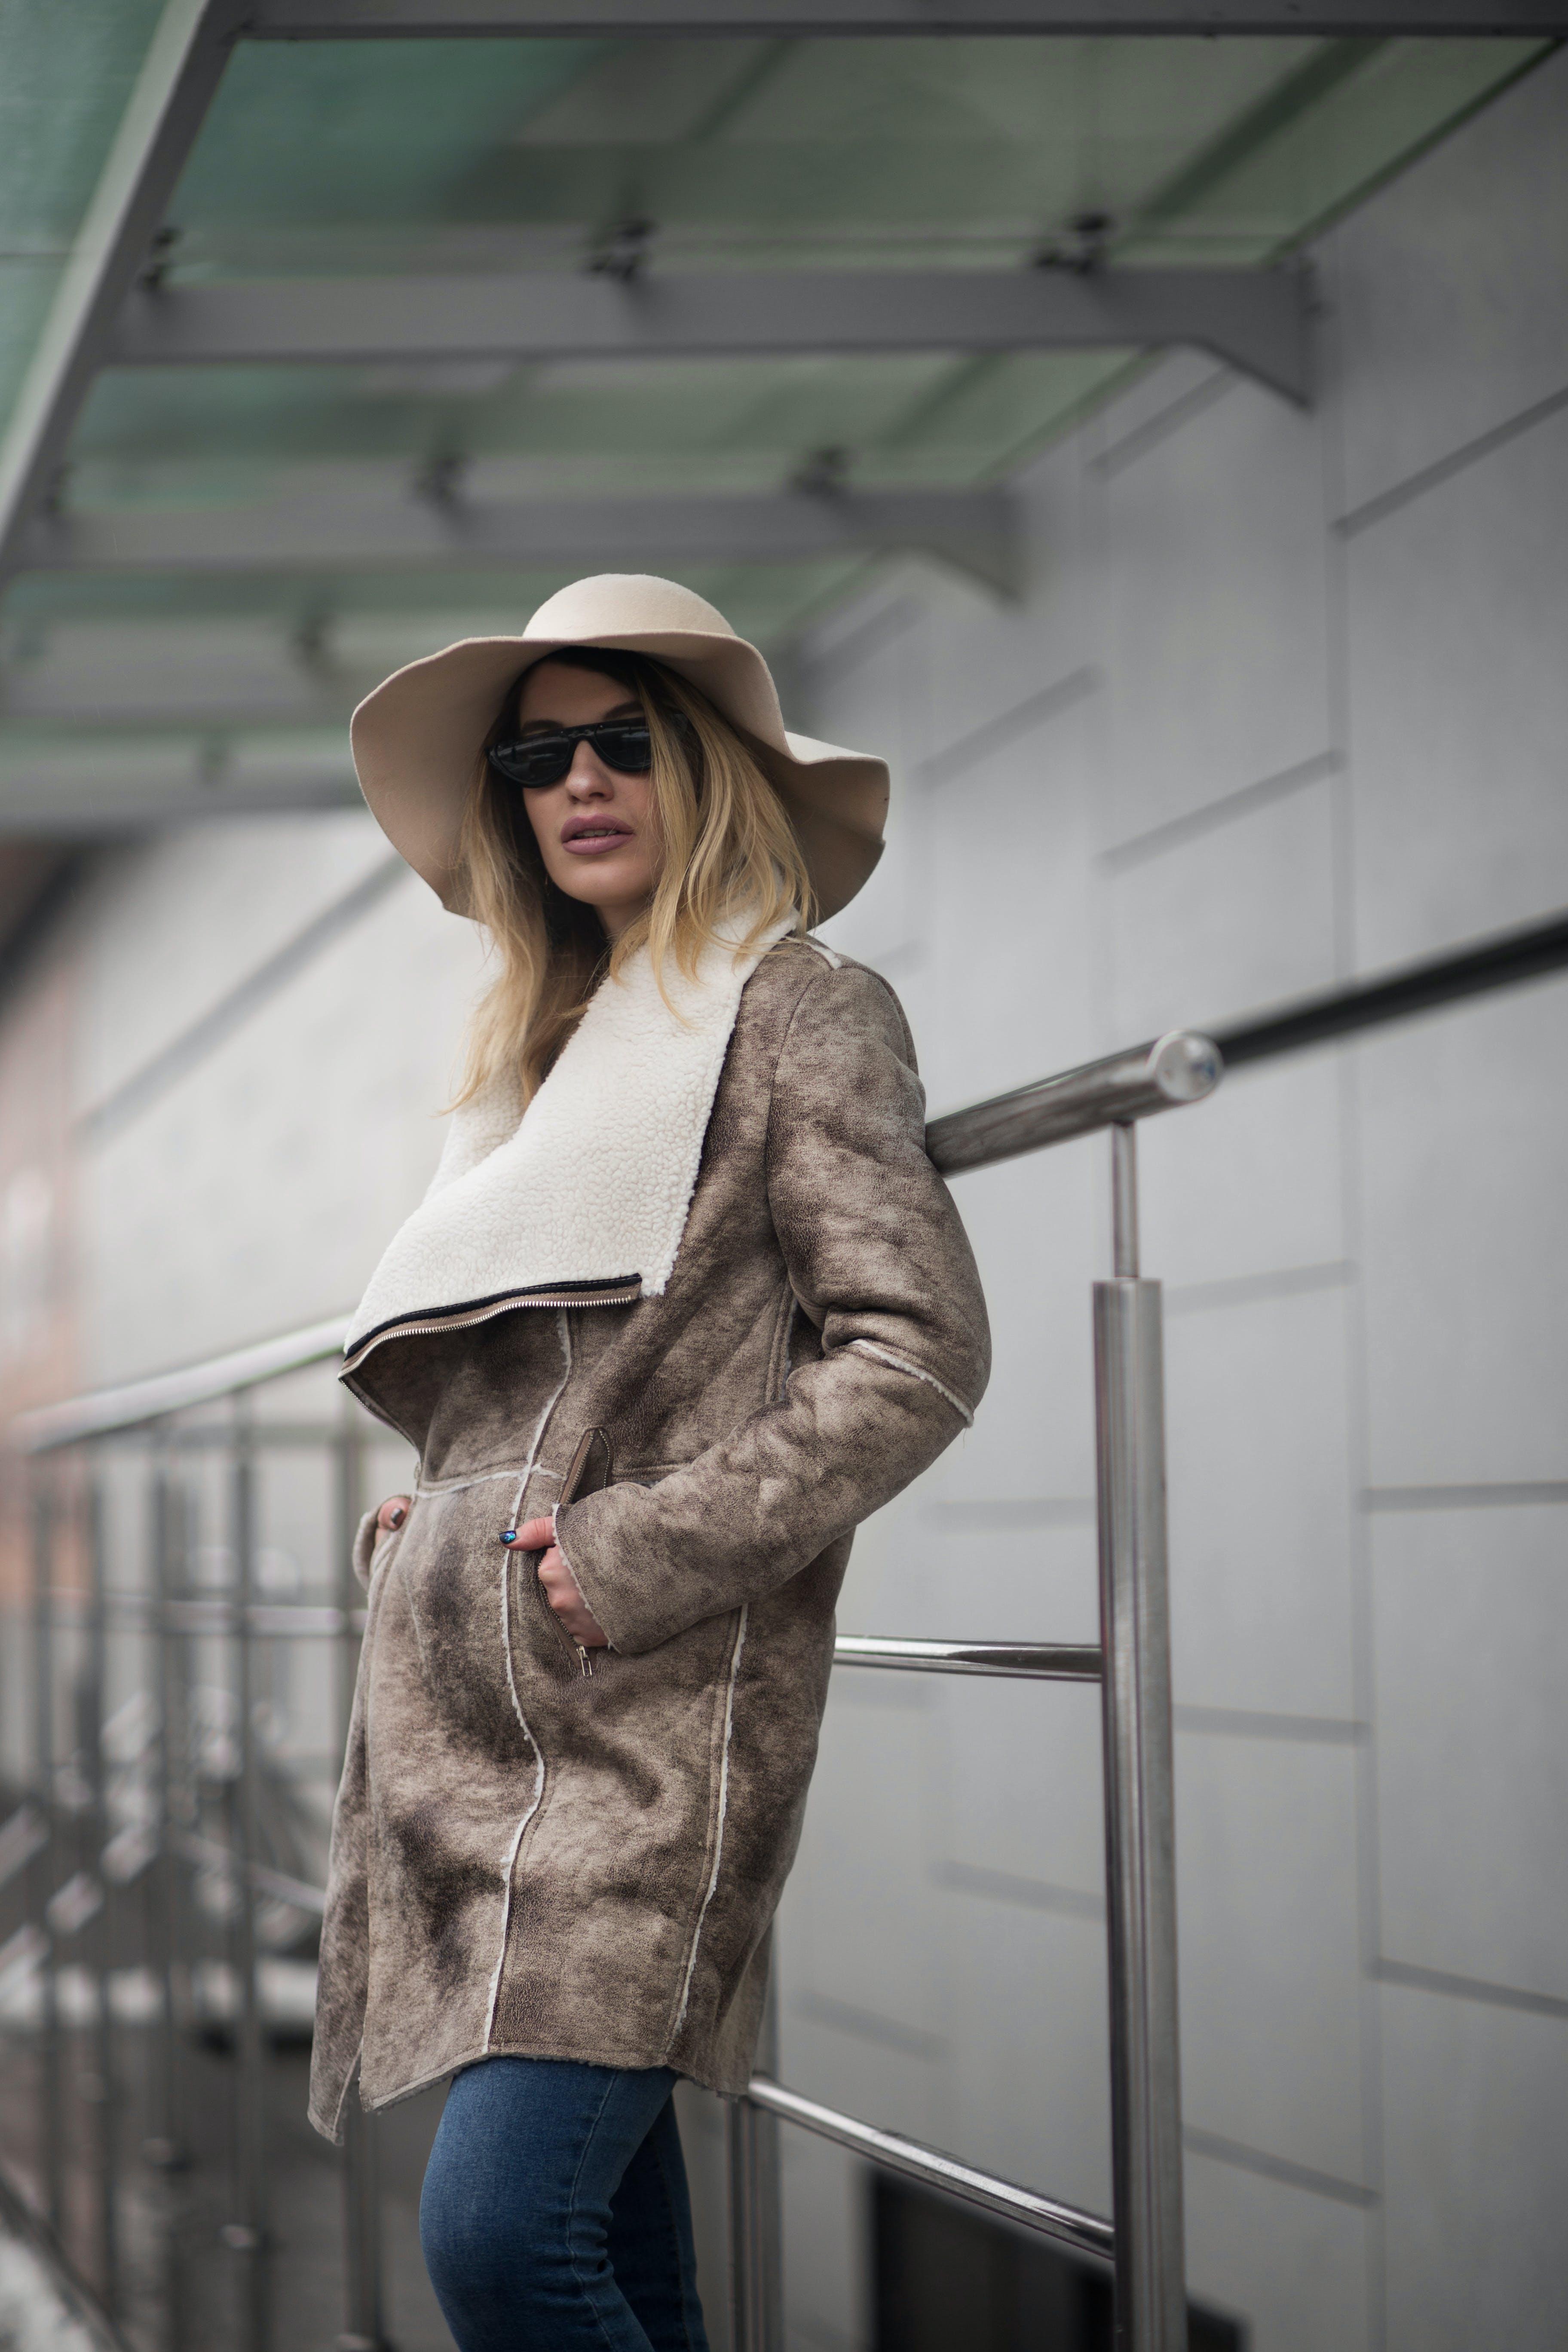 blondes haar, fashion, fotoshooting